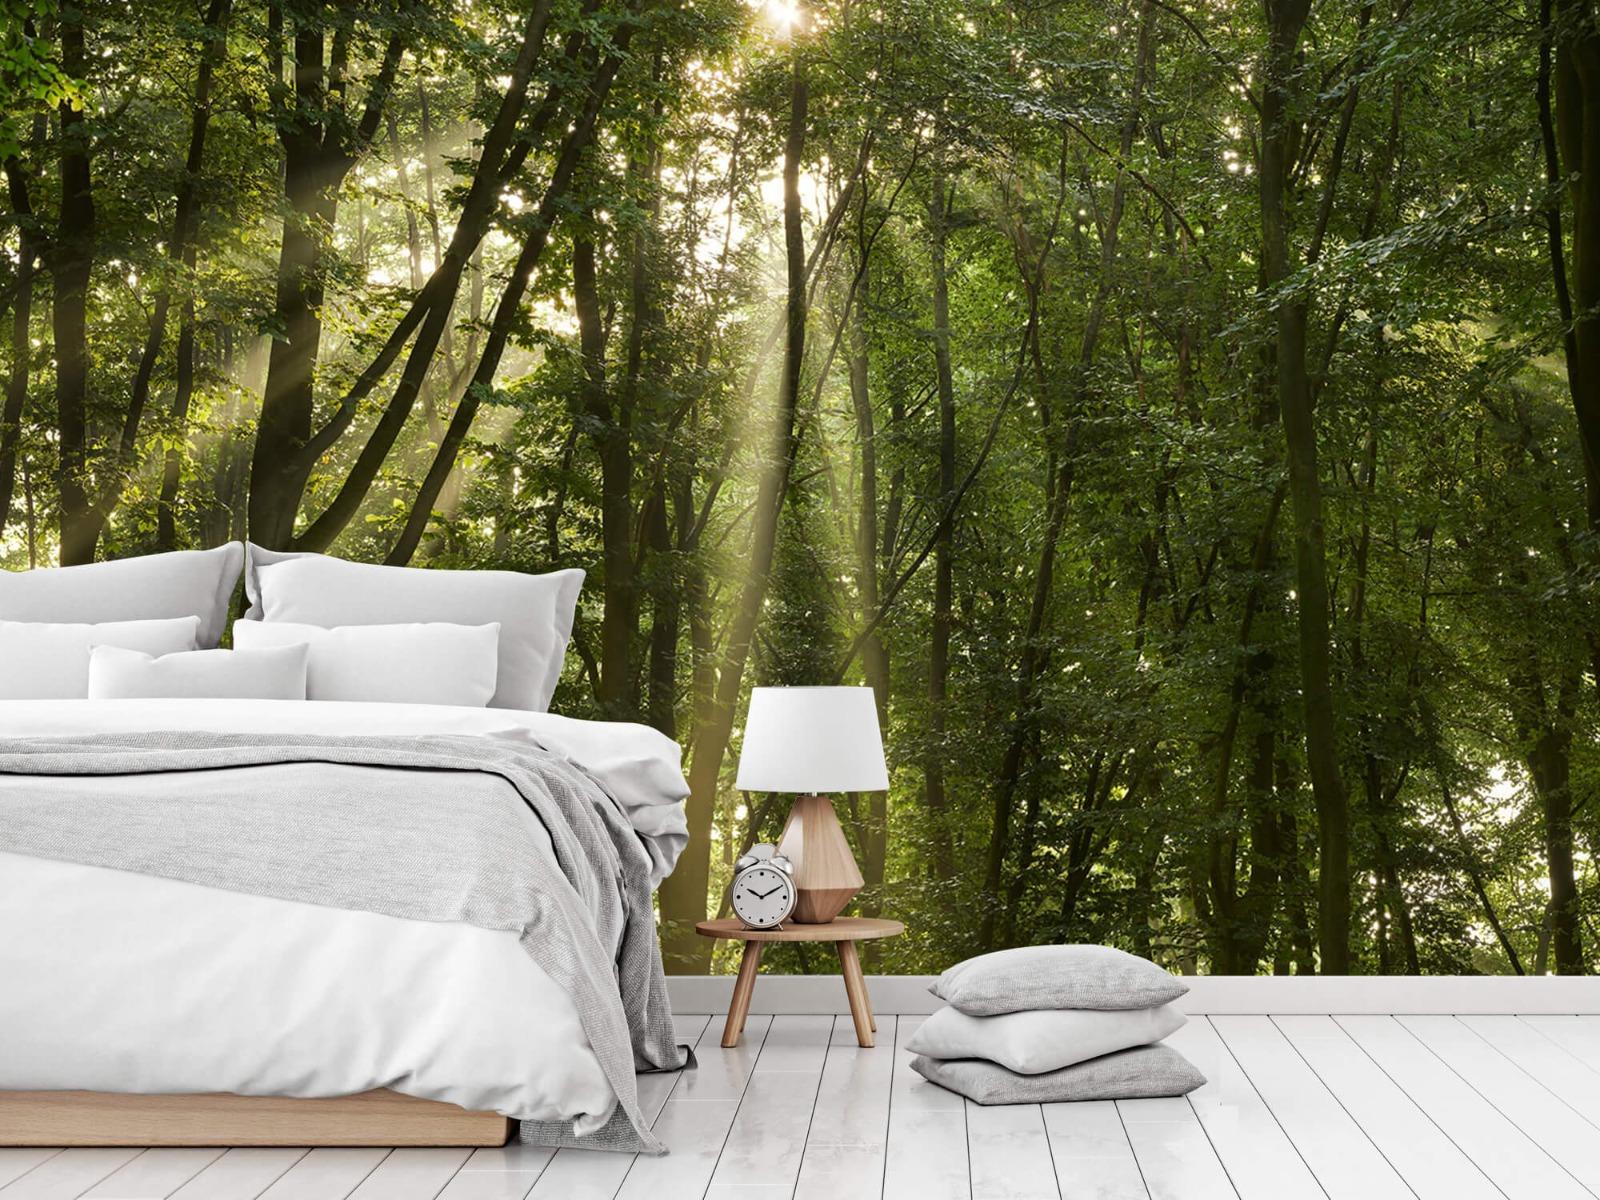 Bomen - Zonnestralen in het bos - Slaapkamer 14